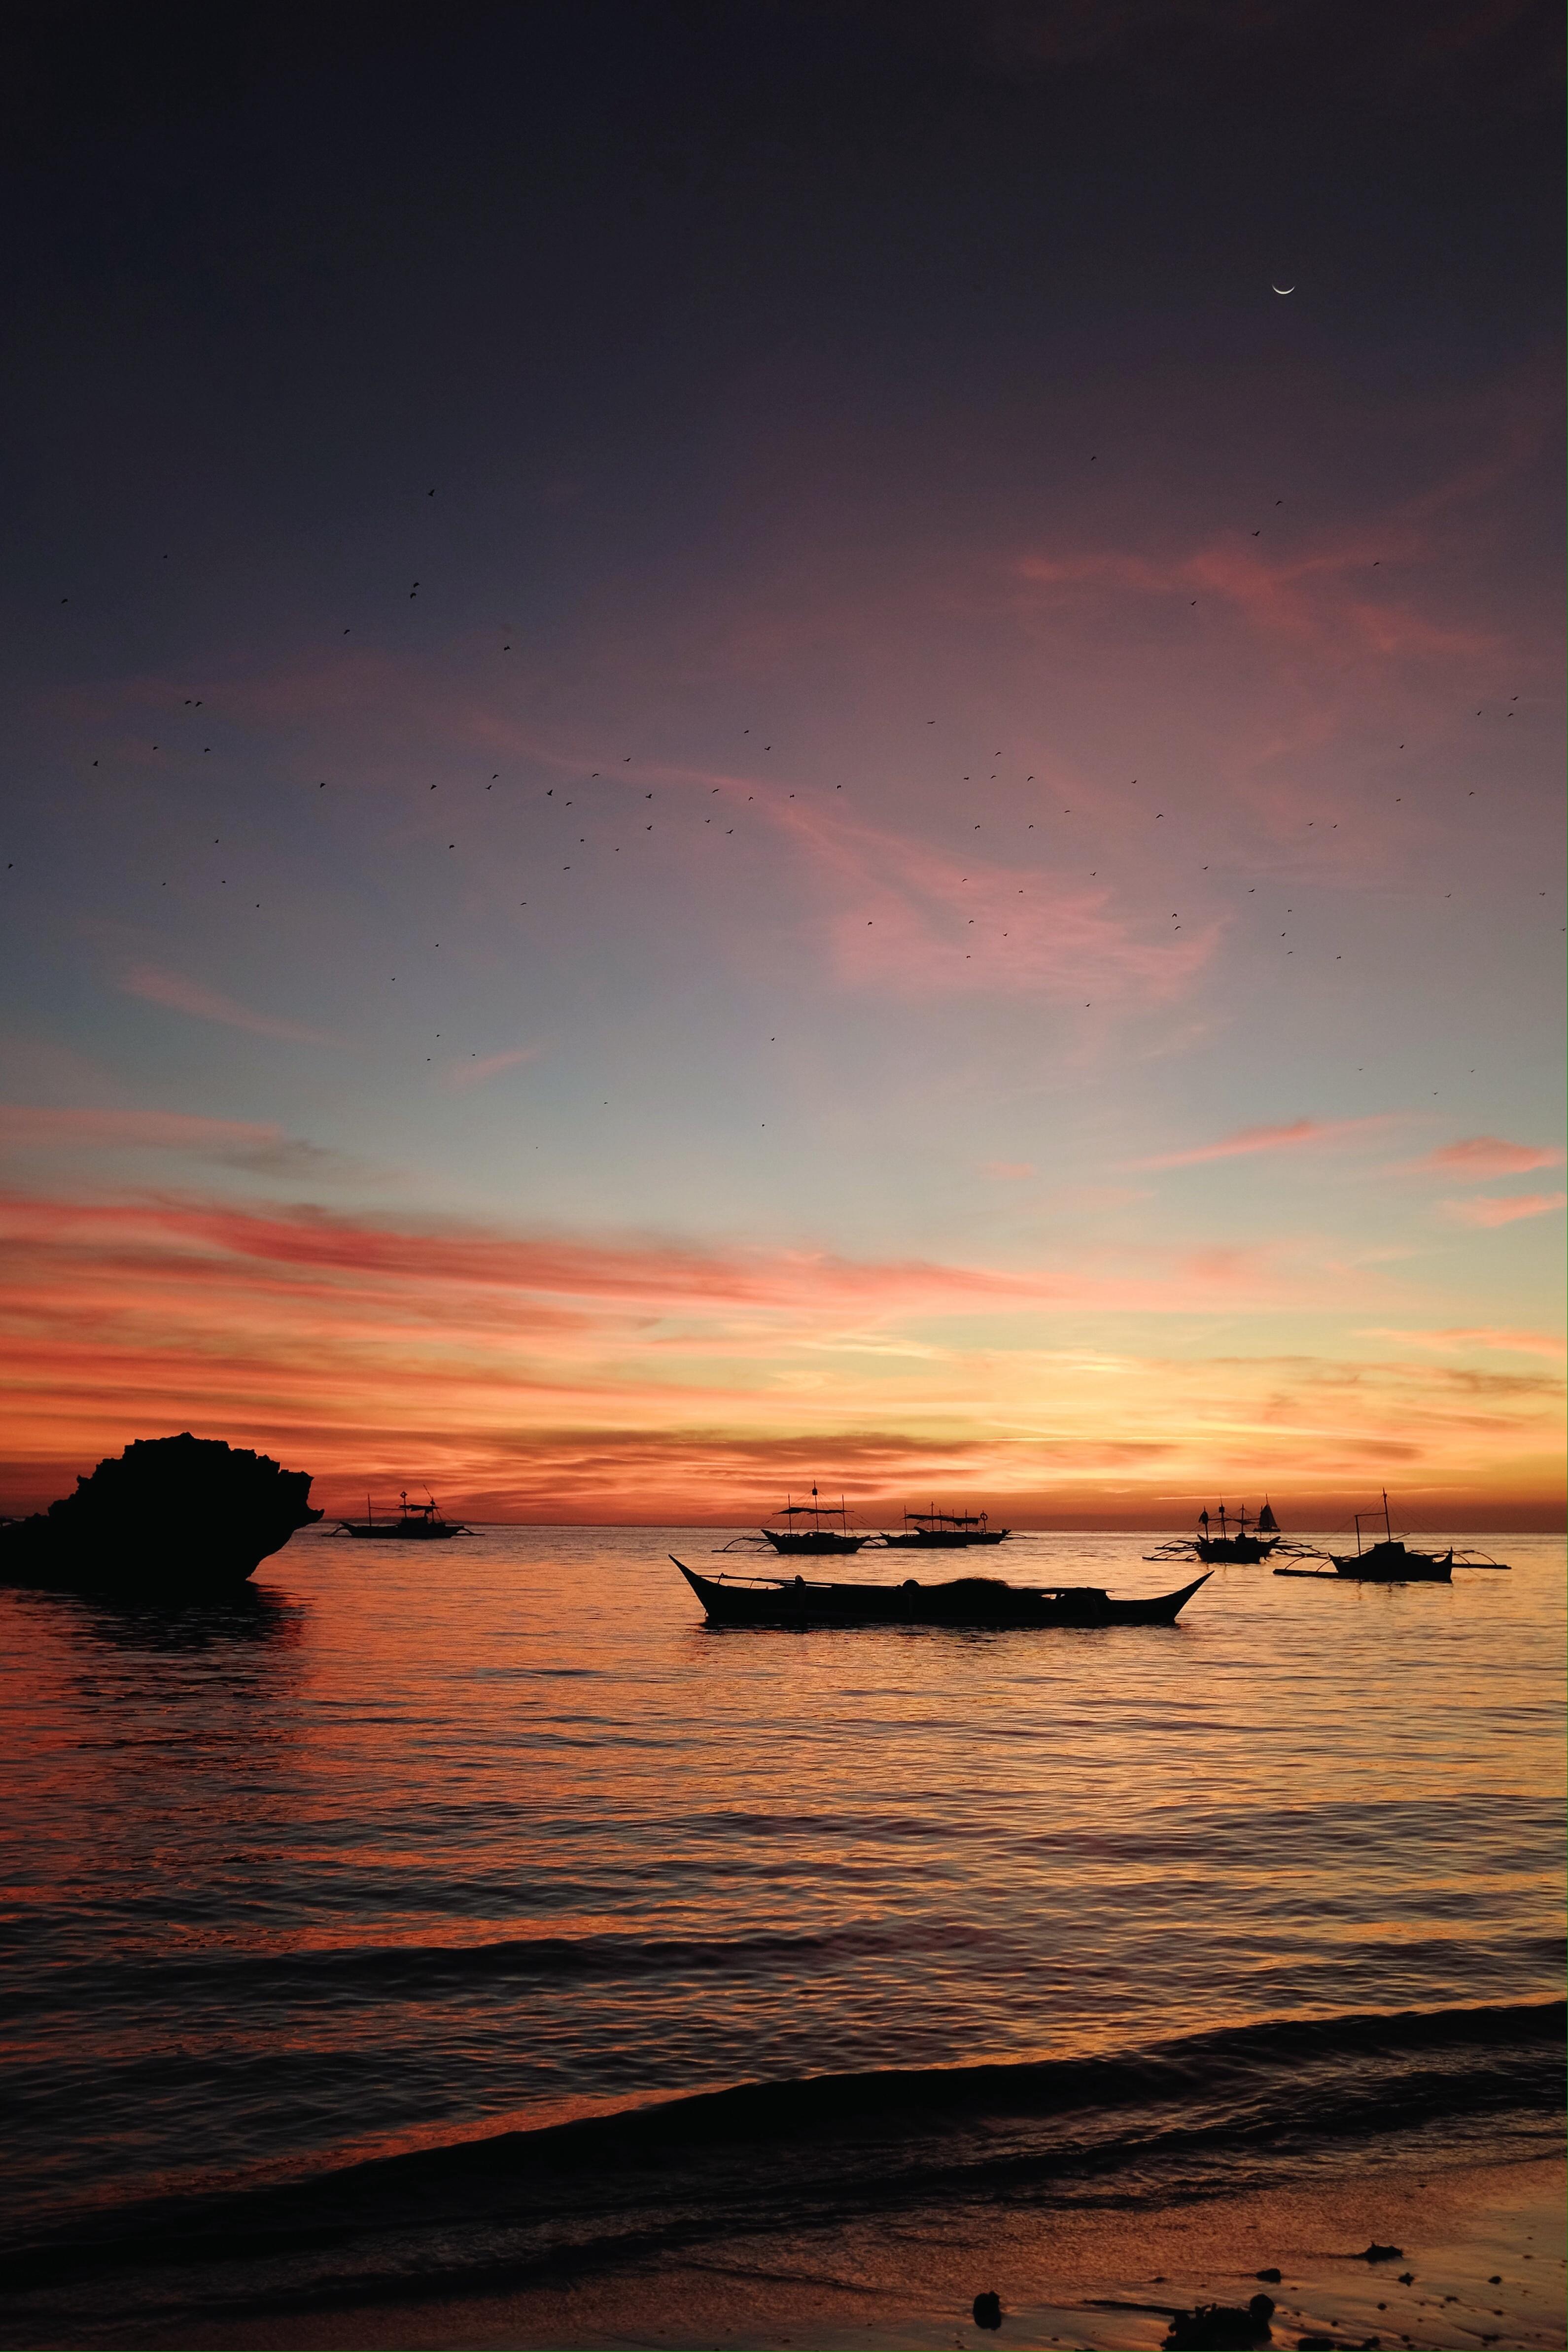 Sunset from Diniwid Beach. The bats are a bonus treat.